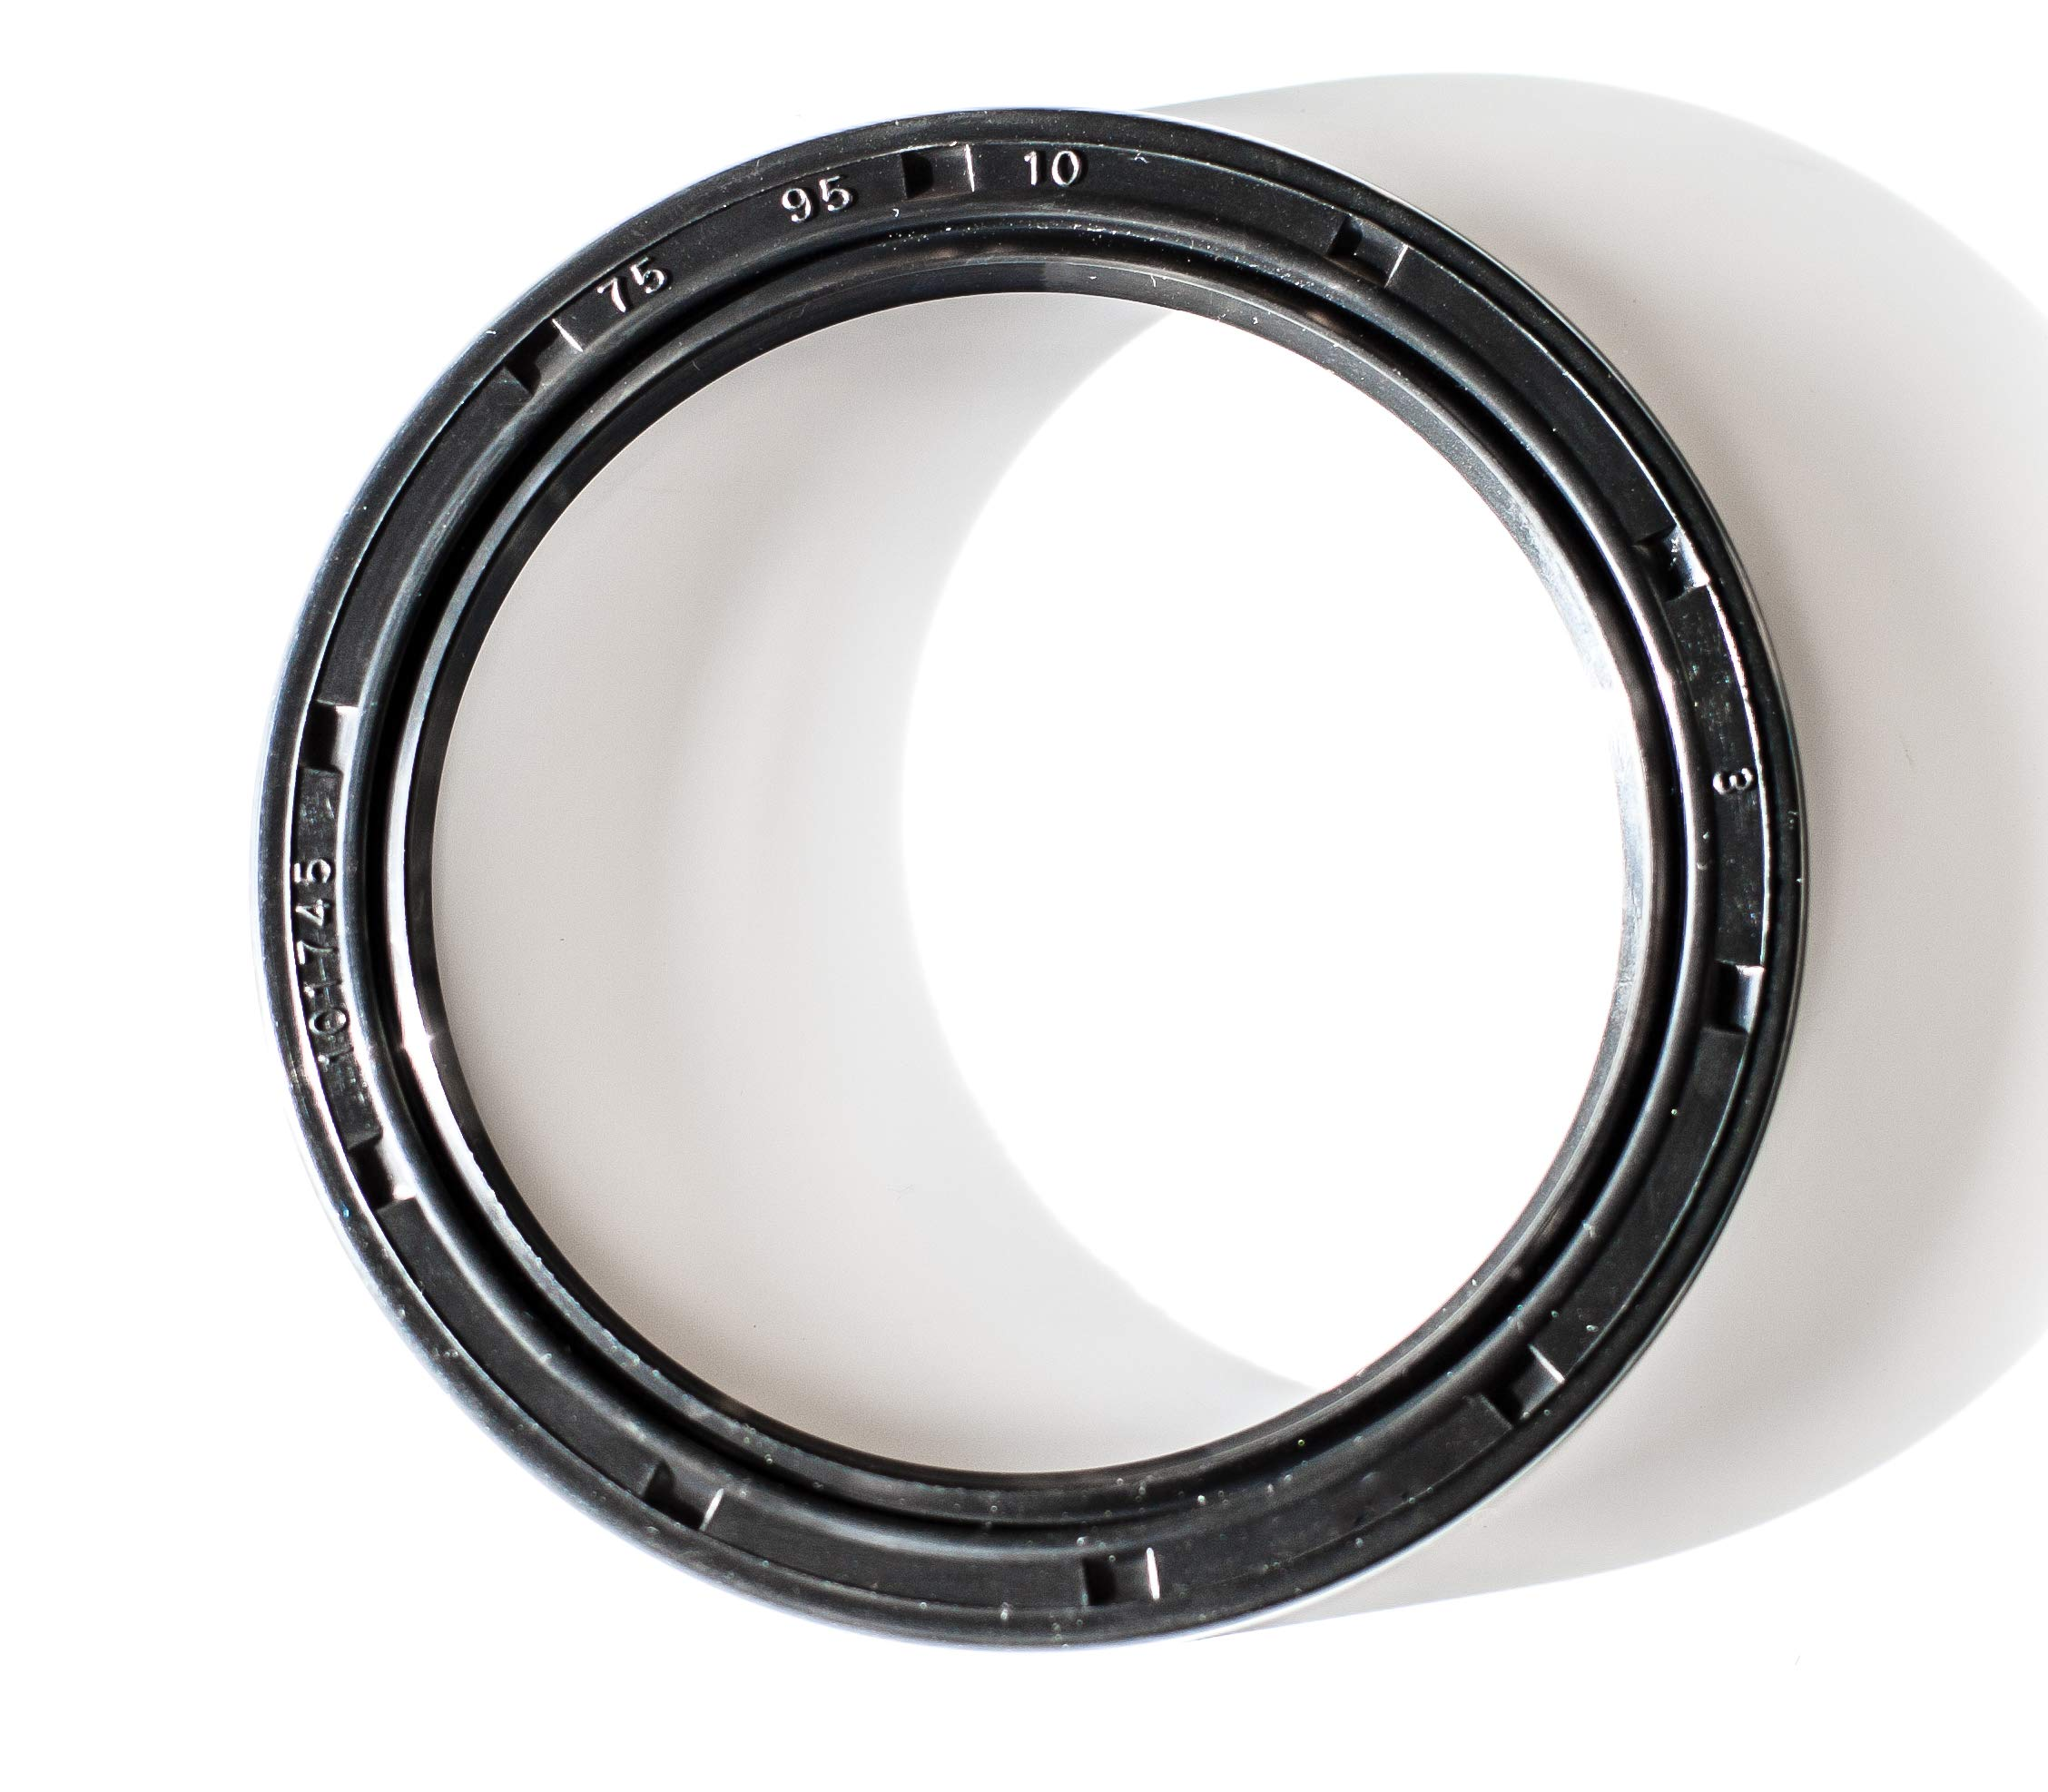 Oil Seal 75X95X10 (10 PCS) Oil Seal Grease Seal TC |EAI Rubber Double Lip w/Garter Spring 75mmX95mmX10mm | 2.953''x3.740''x0.394''